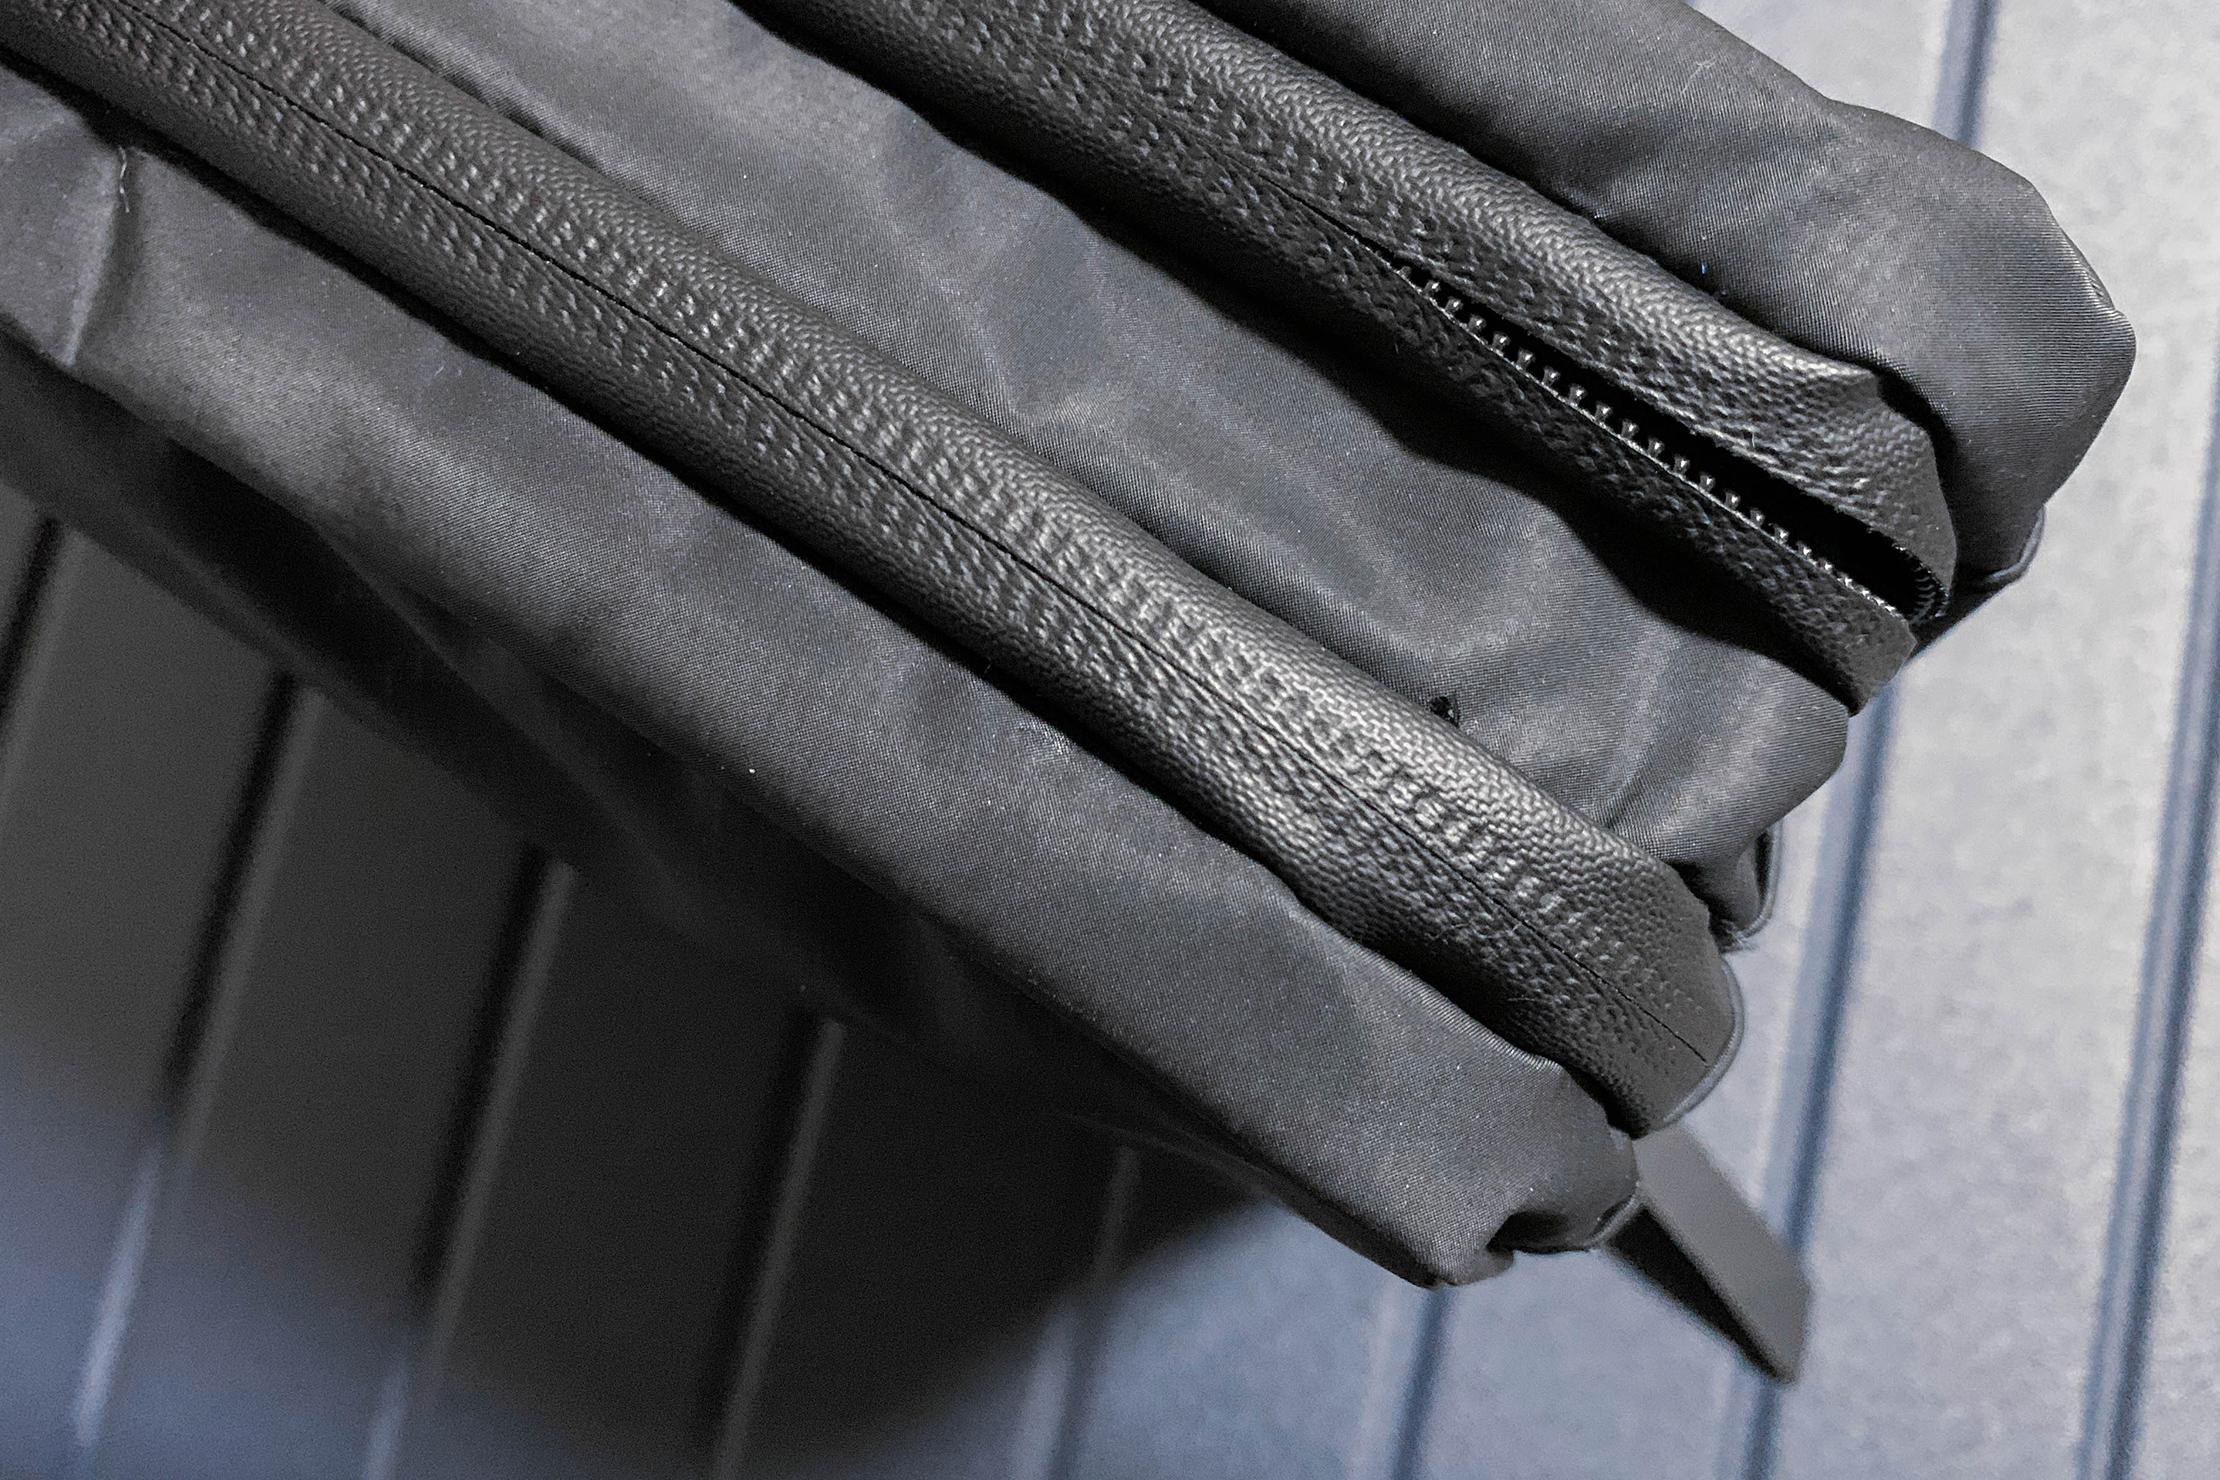 Gravel Explorer Plus Toiletry Bag Broken Zipper